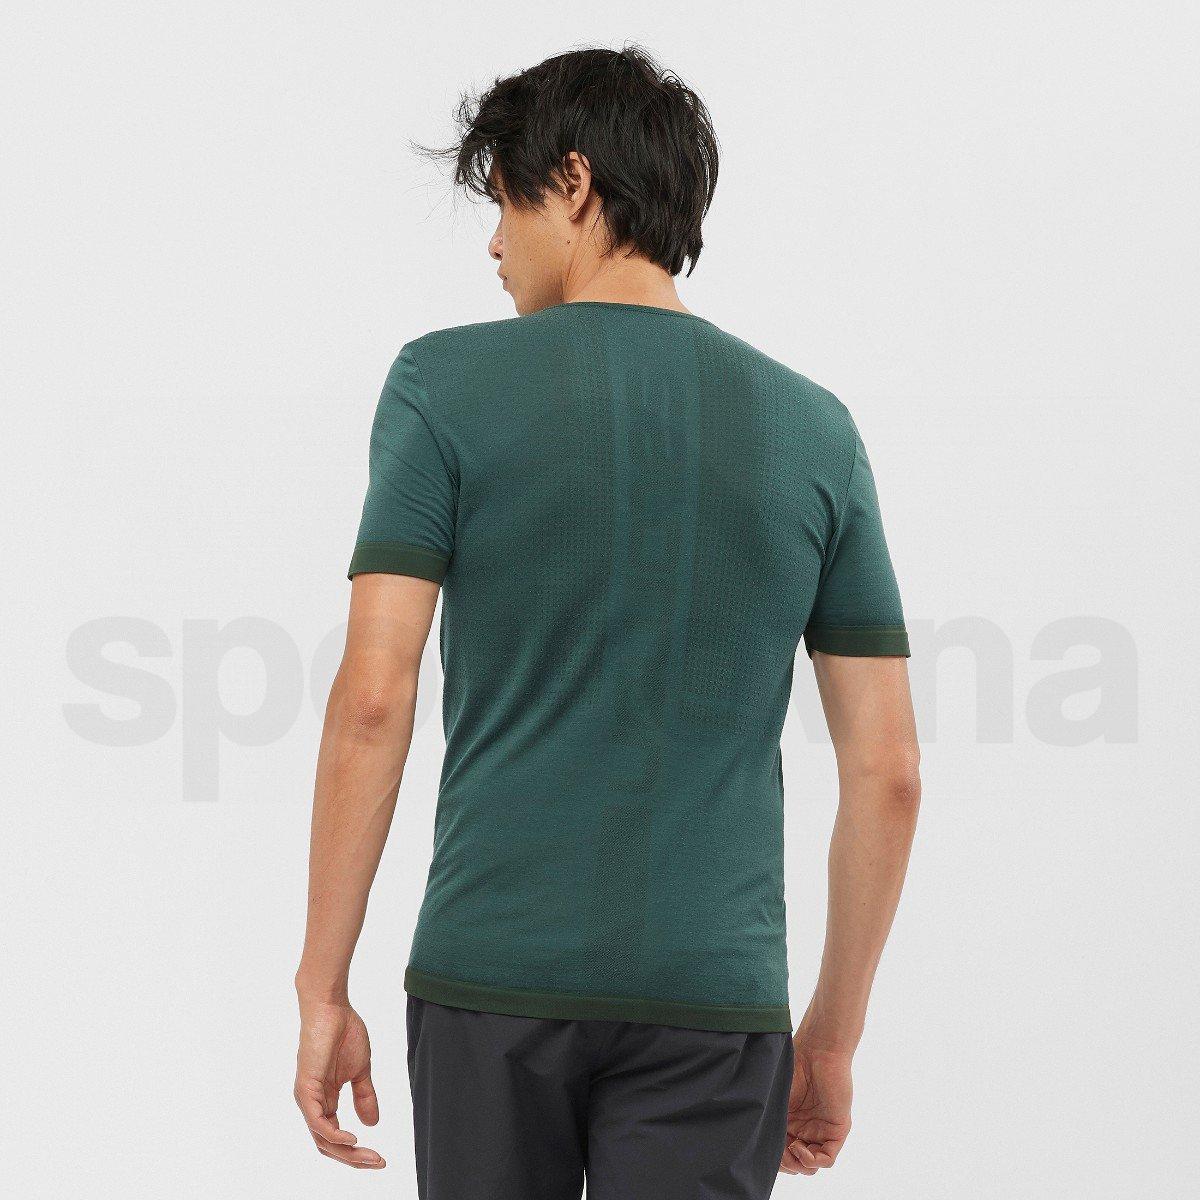 Tričko Salomon OUTSPEED SEAMLESS WOOL TE M - tmavě zelená